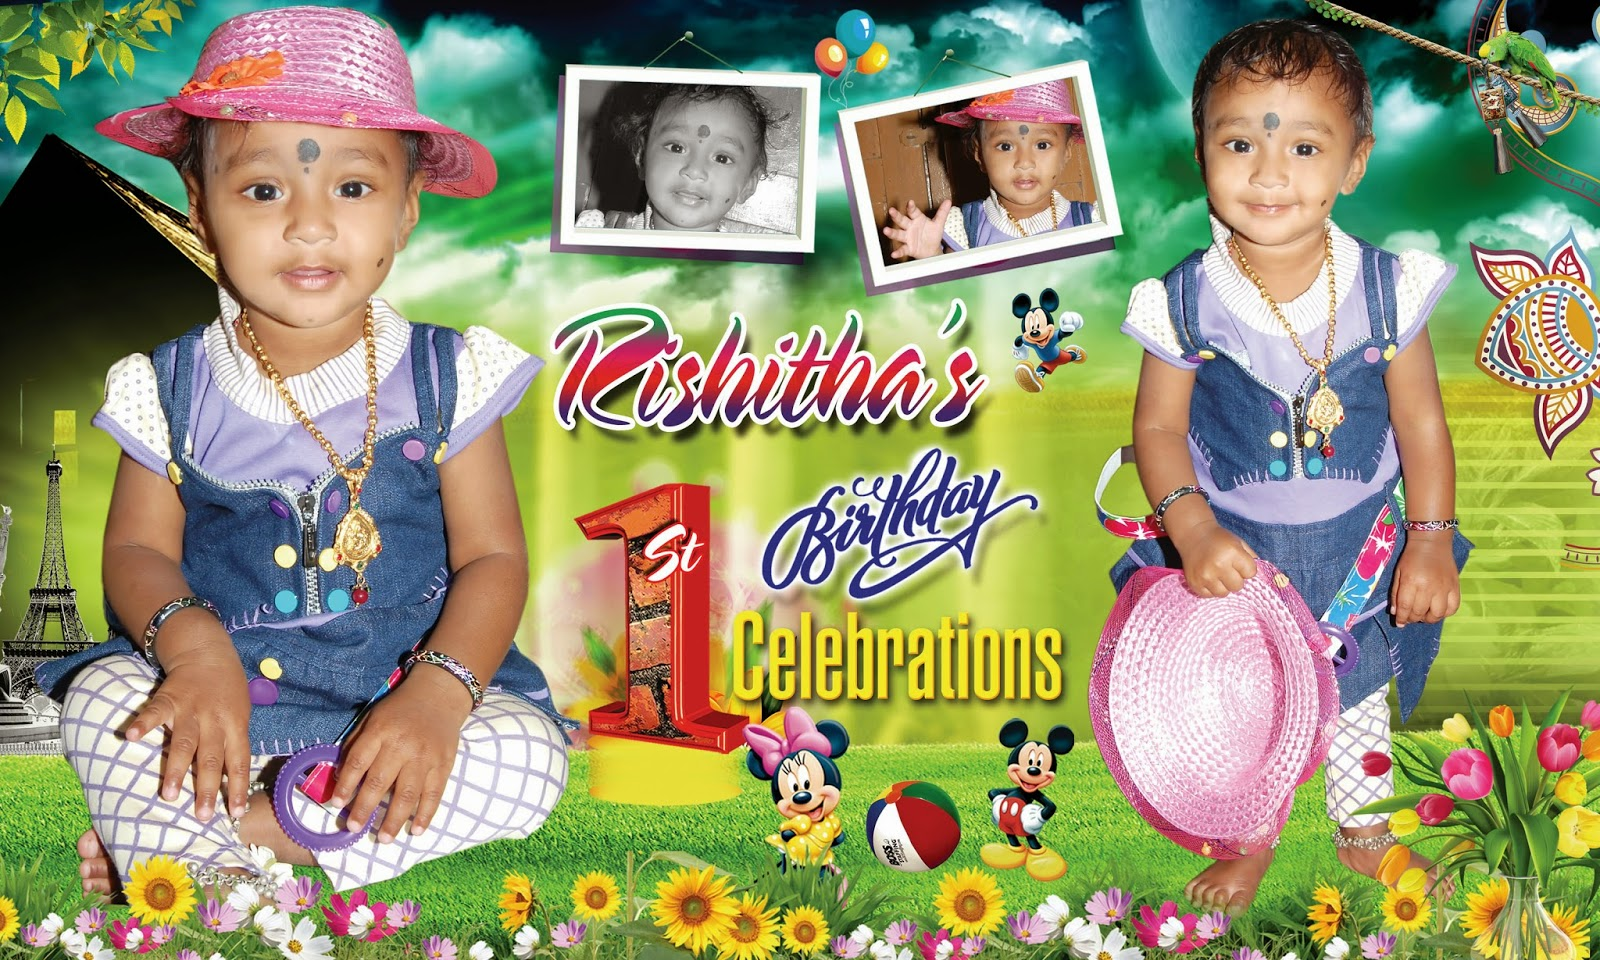 Birthday flex banner design image - ABHAYA ADS | Flex Printing